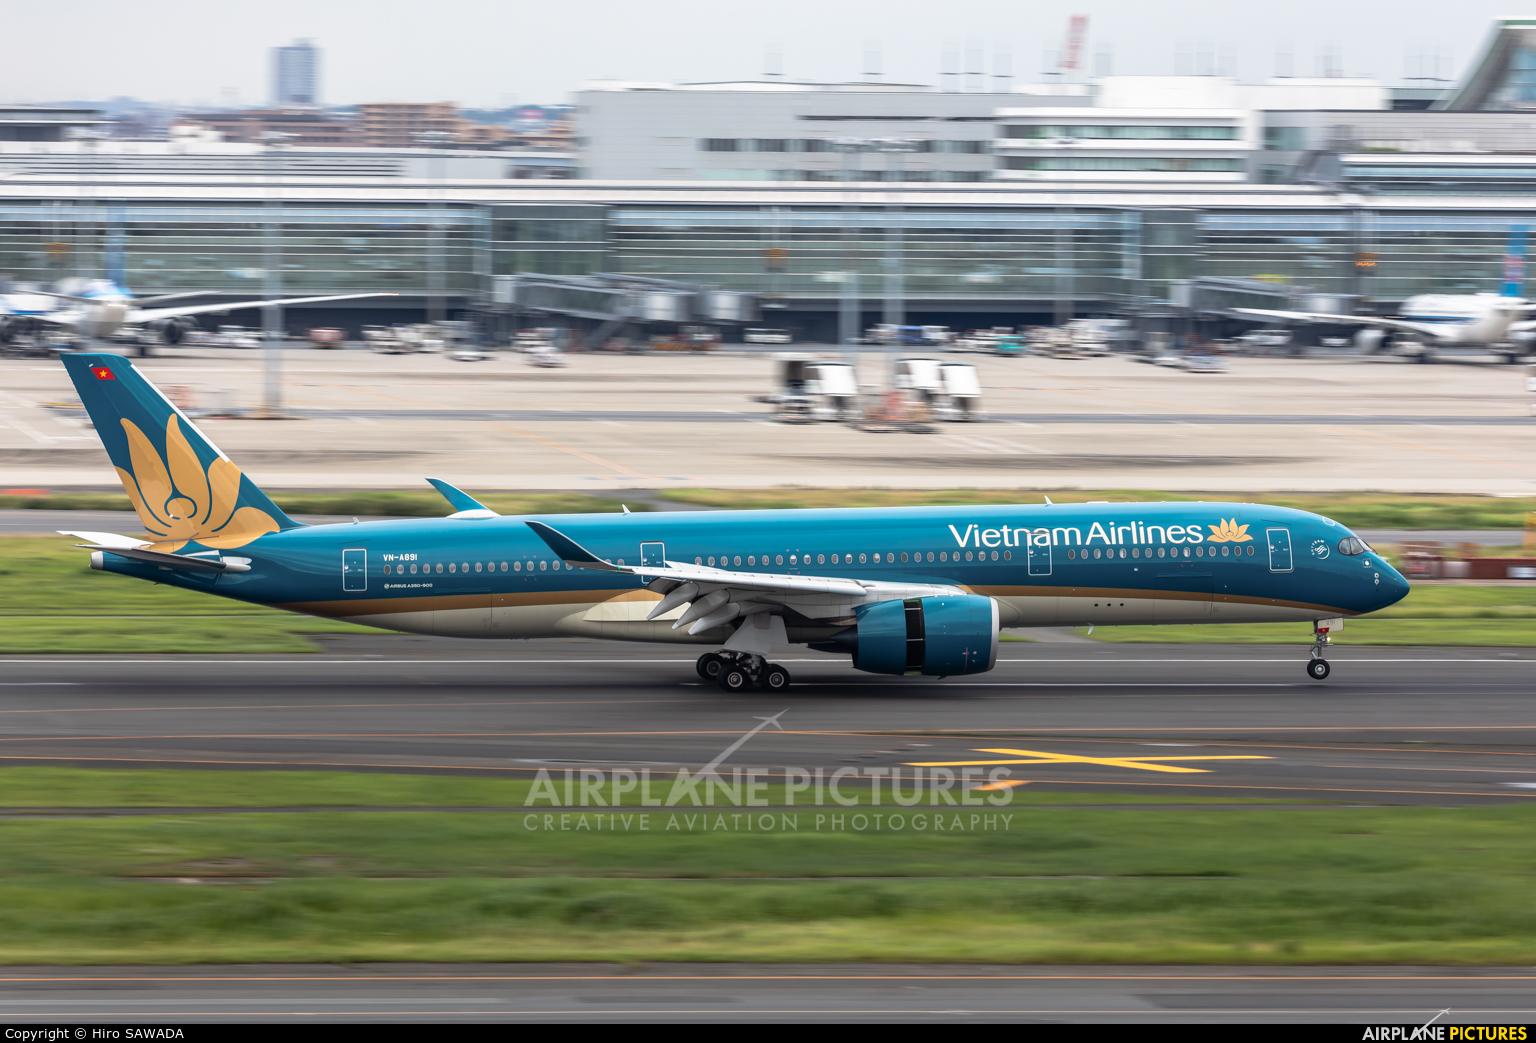 Vietnam Airlines VN-A891 aircraft at Tokyo - Haneda Intl